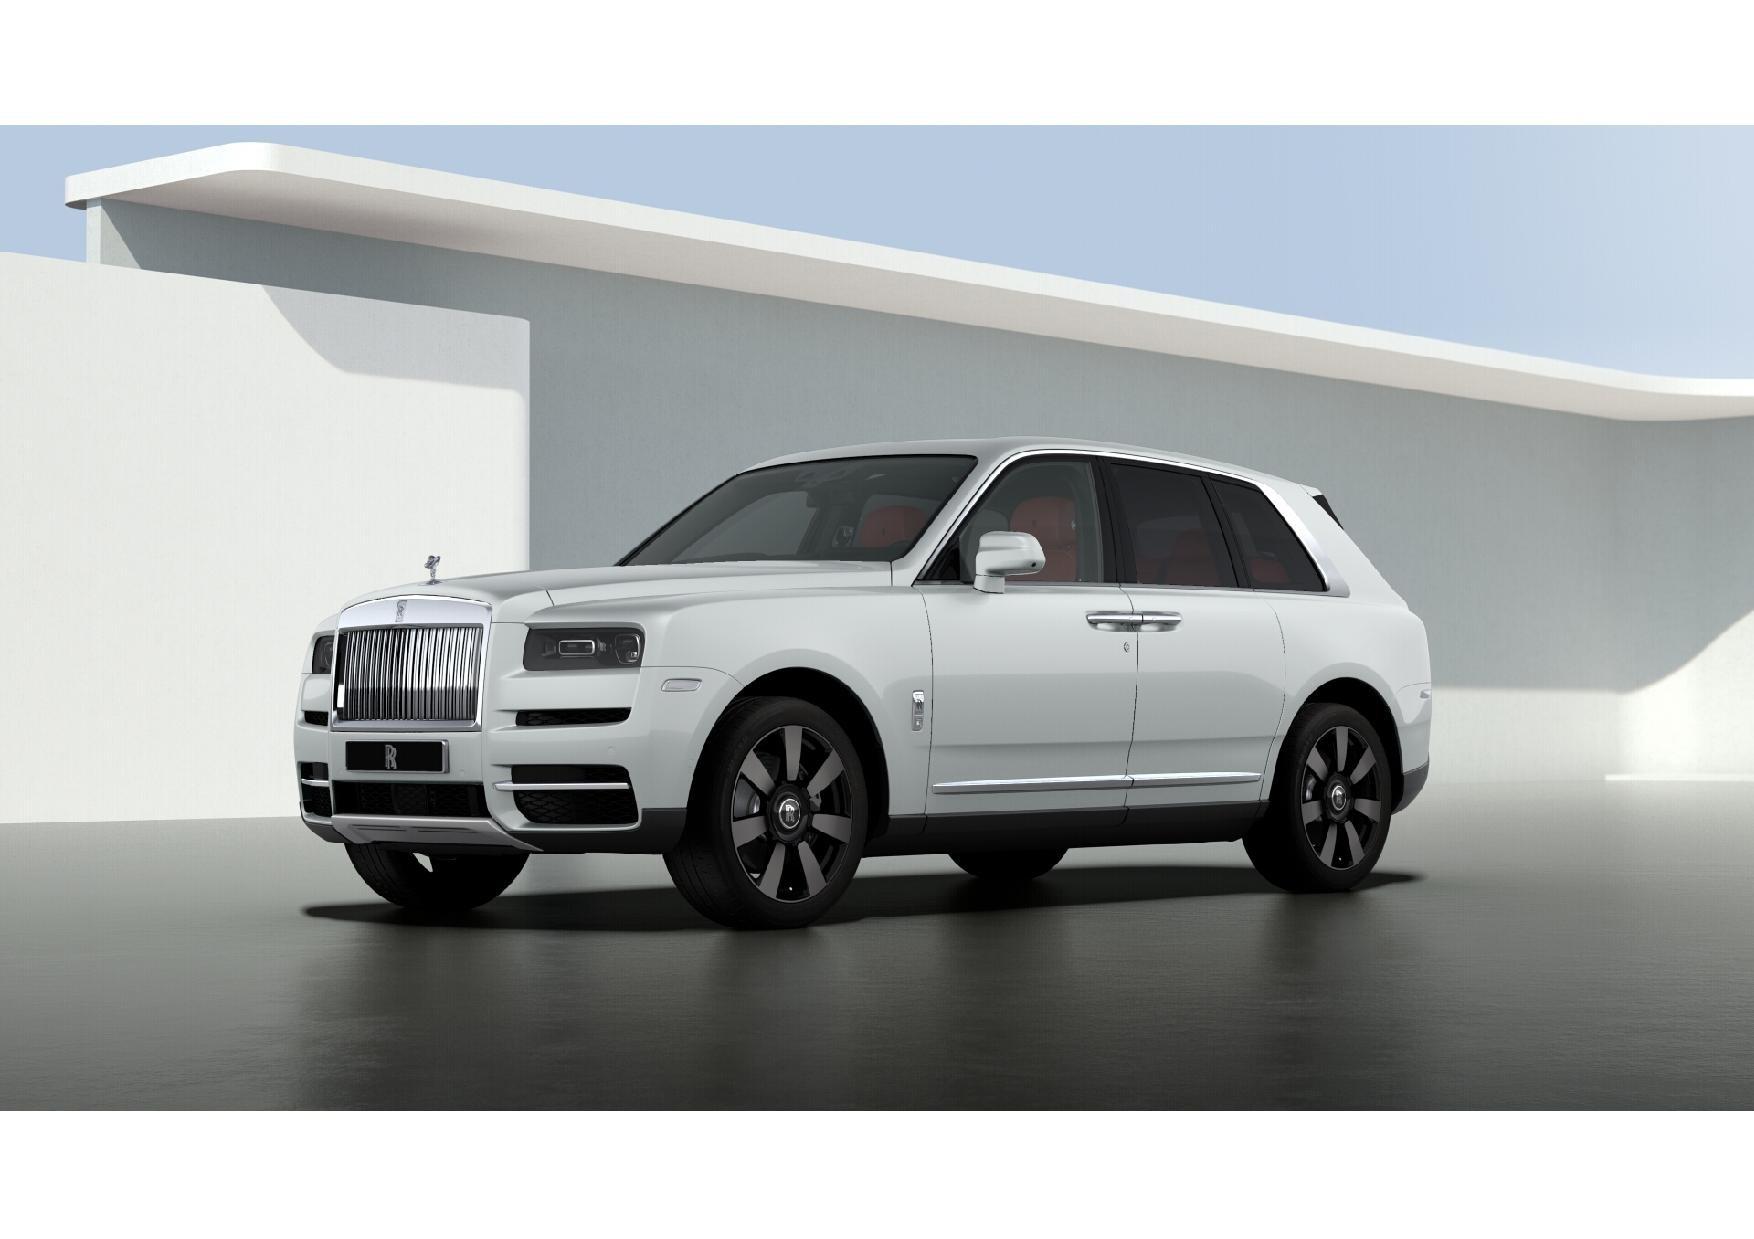 New 2021 Rolls-Royce Cullinan Base for sale $376,925 at Rolls-Royce Motor Cars Greenwich in Greenwich CT 06830 1